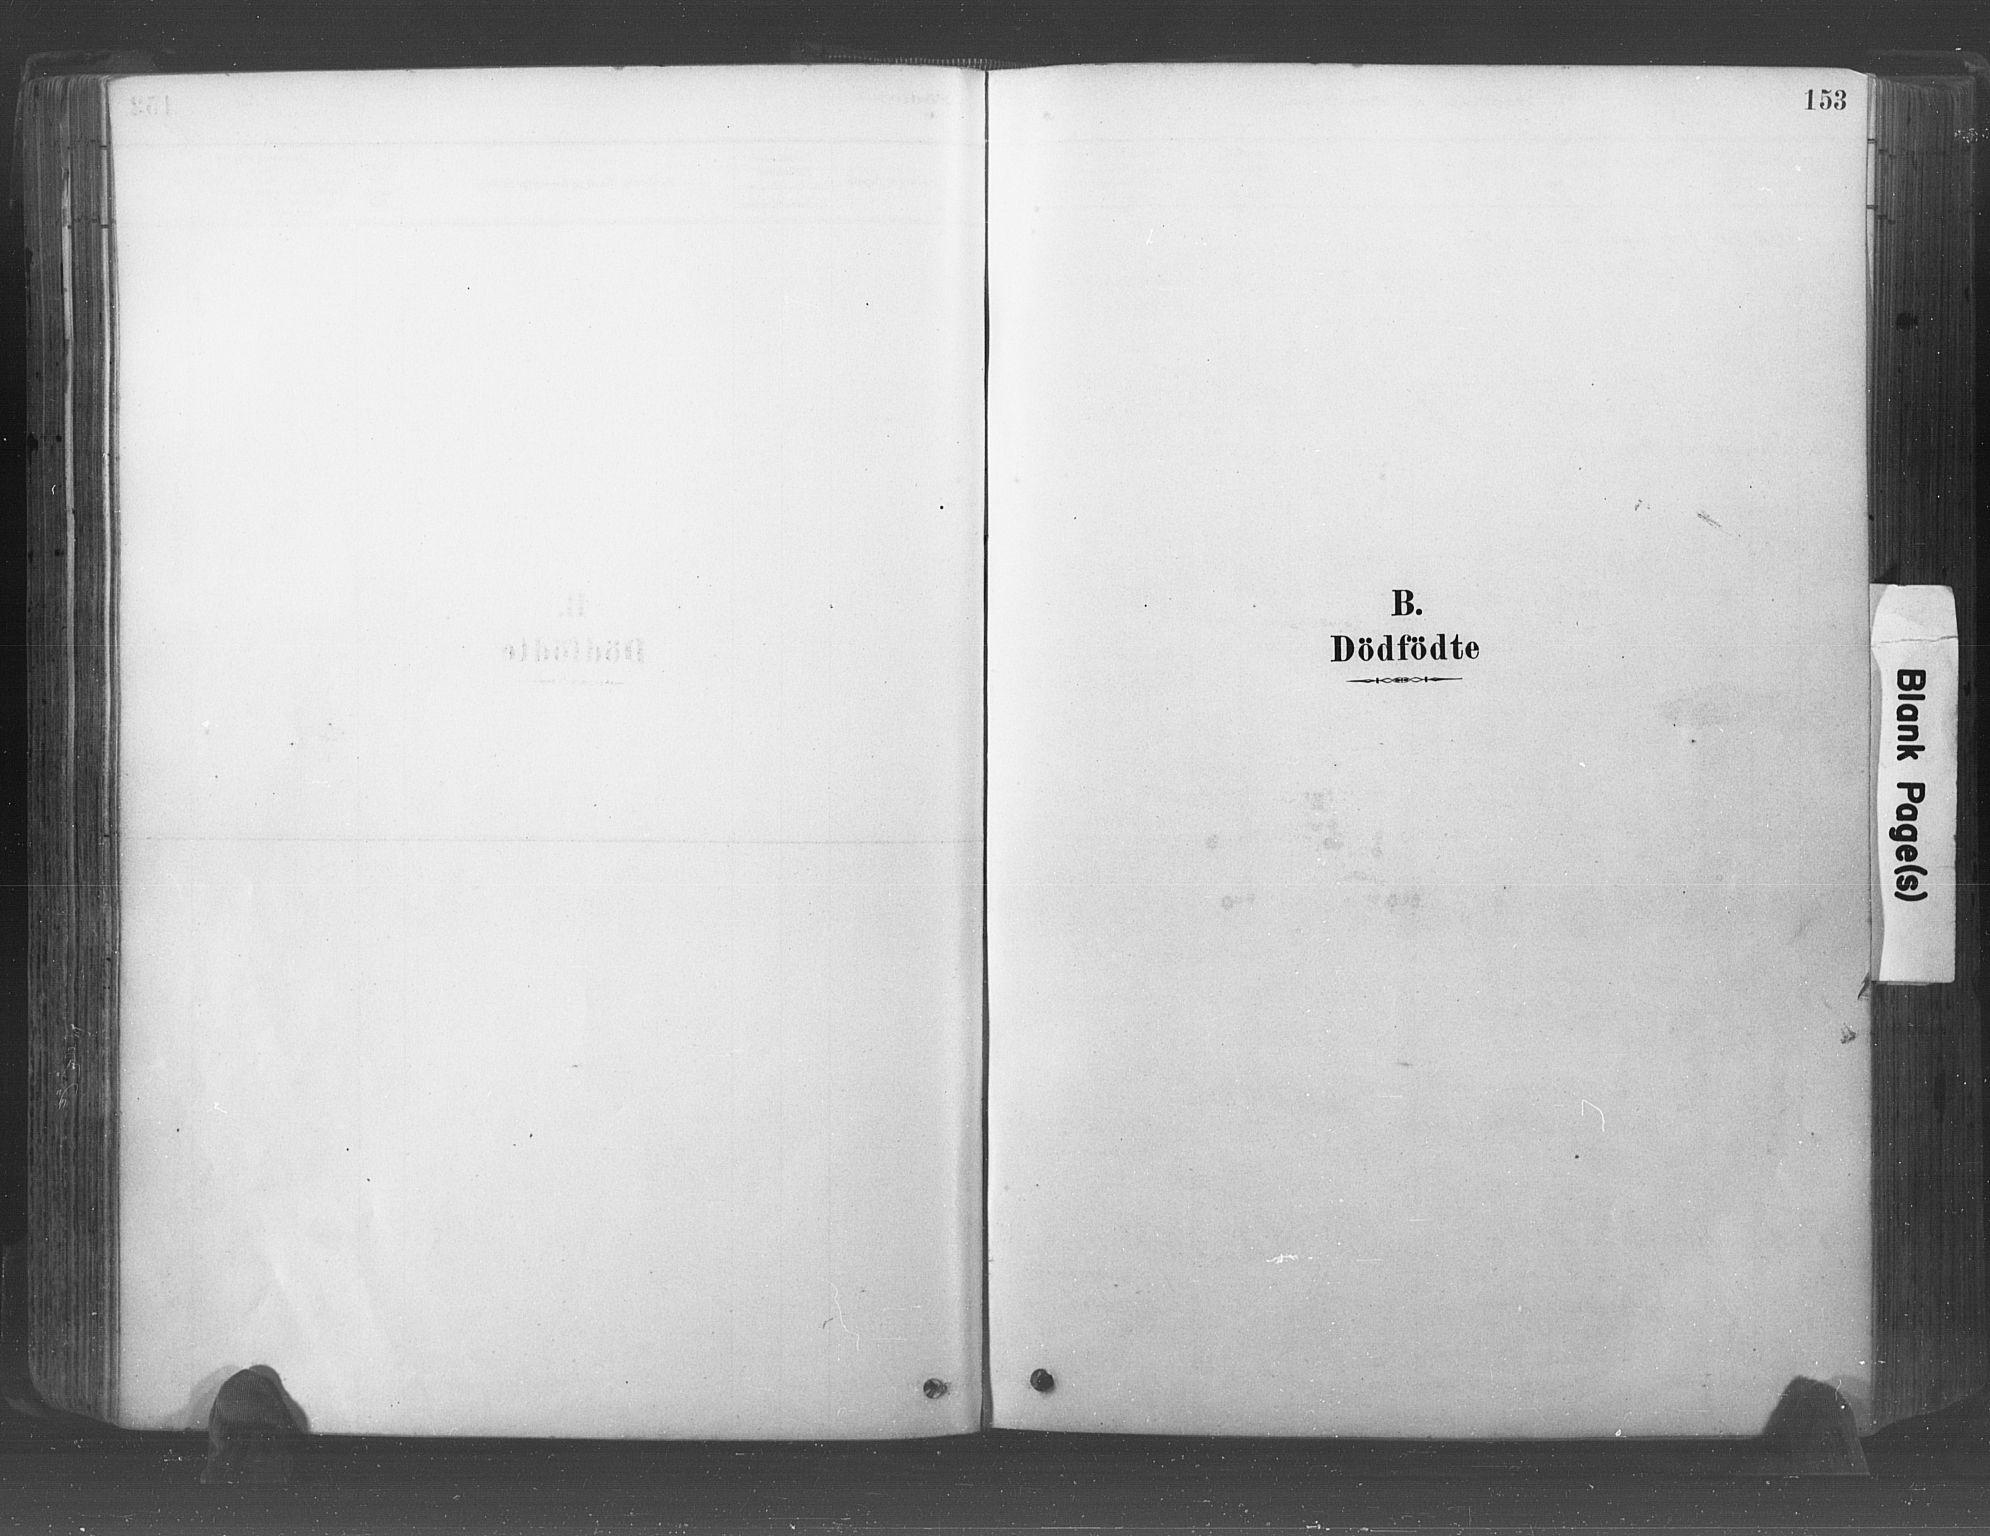 SAO, Råde prestekontor kirkebøker, F/Fa/L0007: Ministerialbok nr. 7, 1878-1902, s. 153